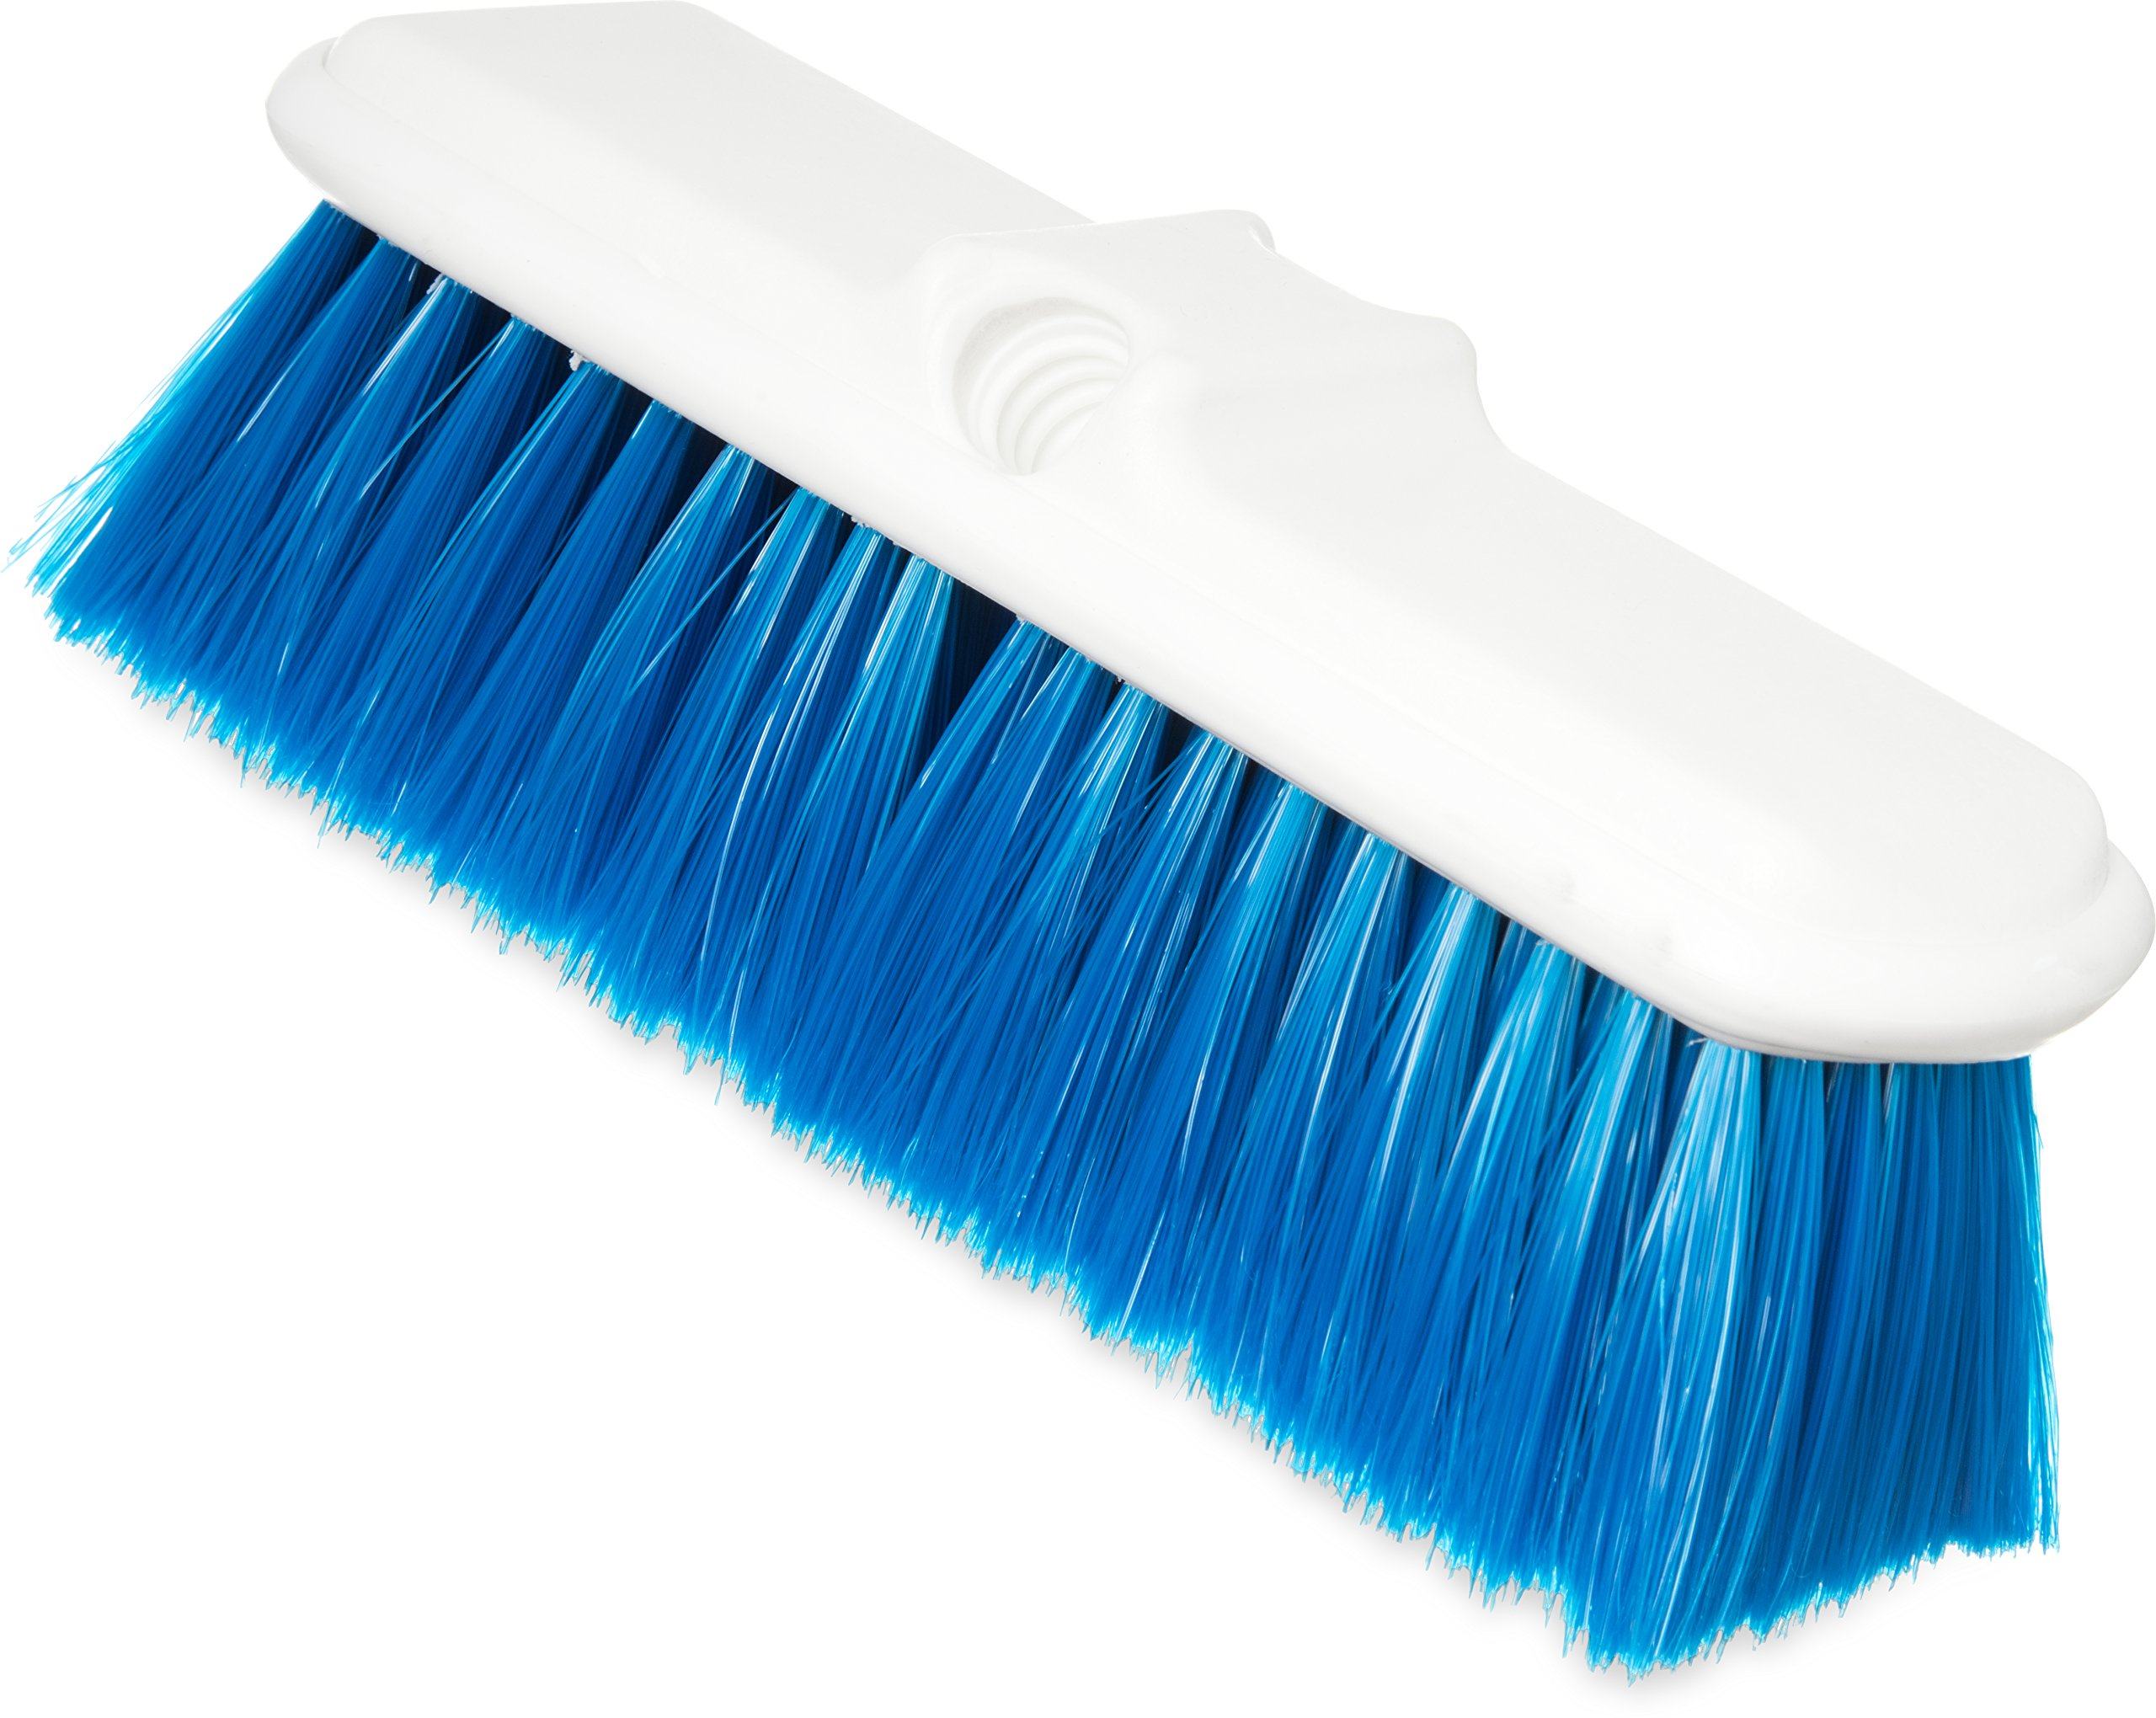 Carlisle 4005014 Plastic Block Flo-Thru Brush, Flagged Nylex Bristles, 9-1/2'' Overall Length x 3'' Width, 2-1/2'' Bristle Trim, Blue (Case of 12)